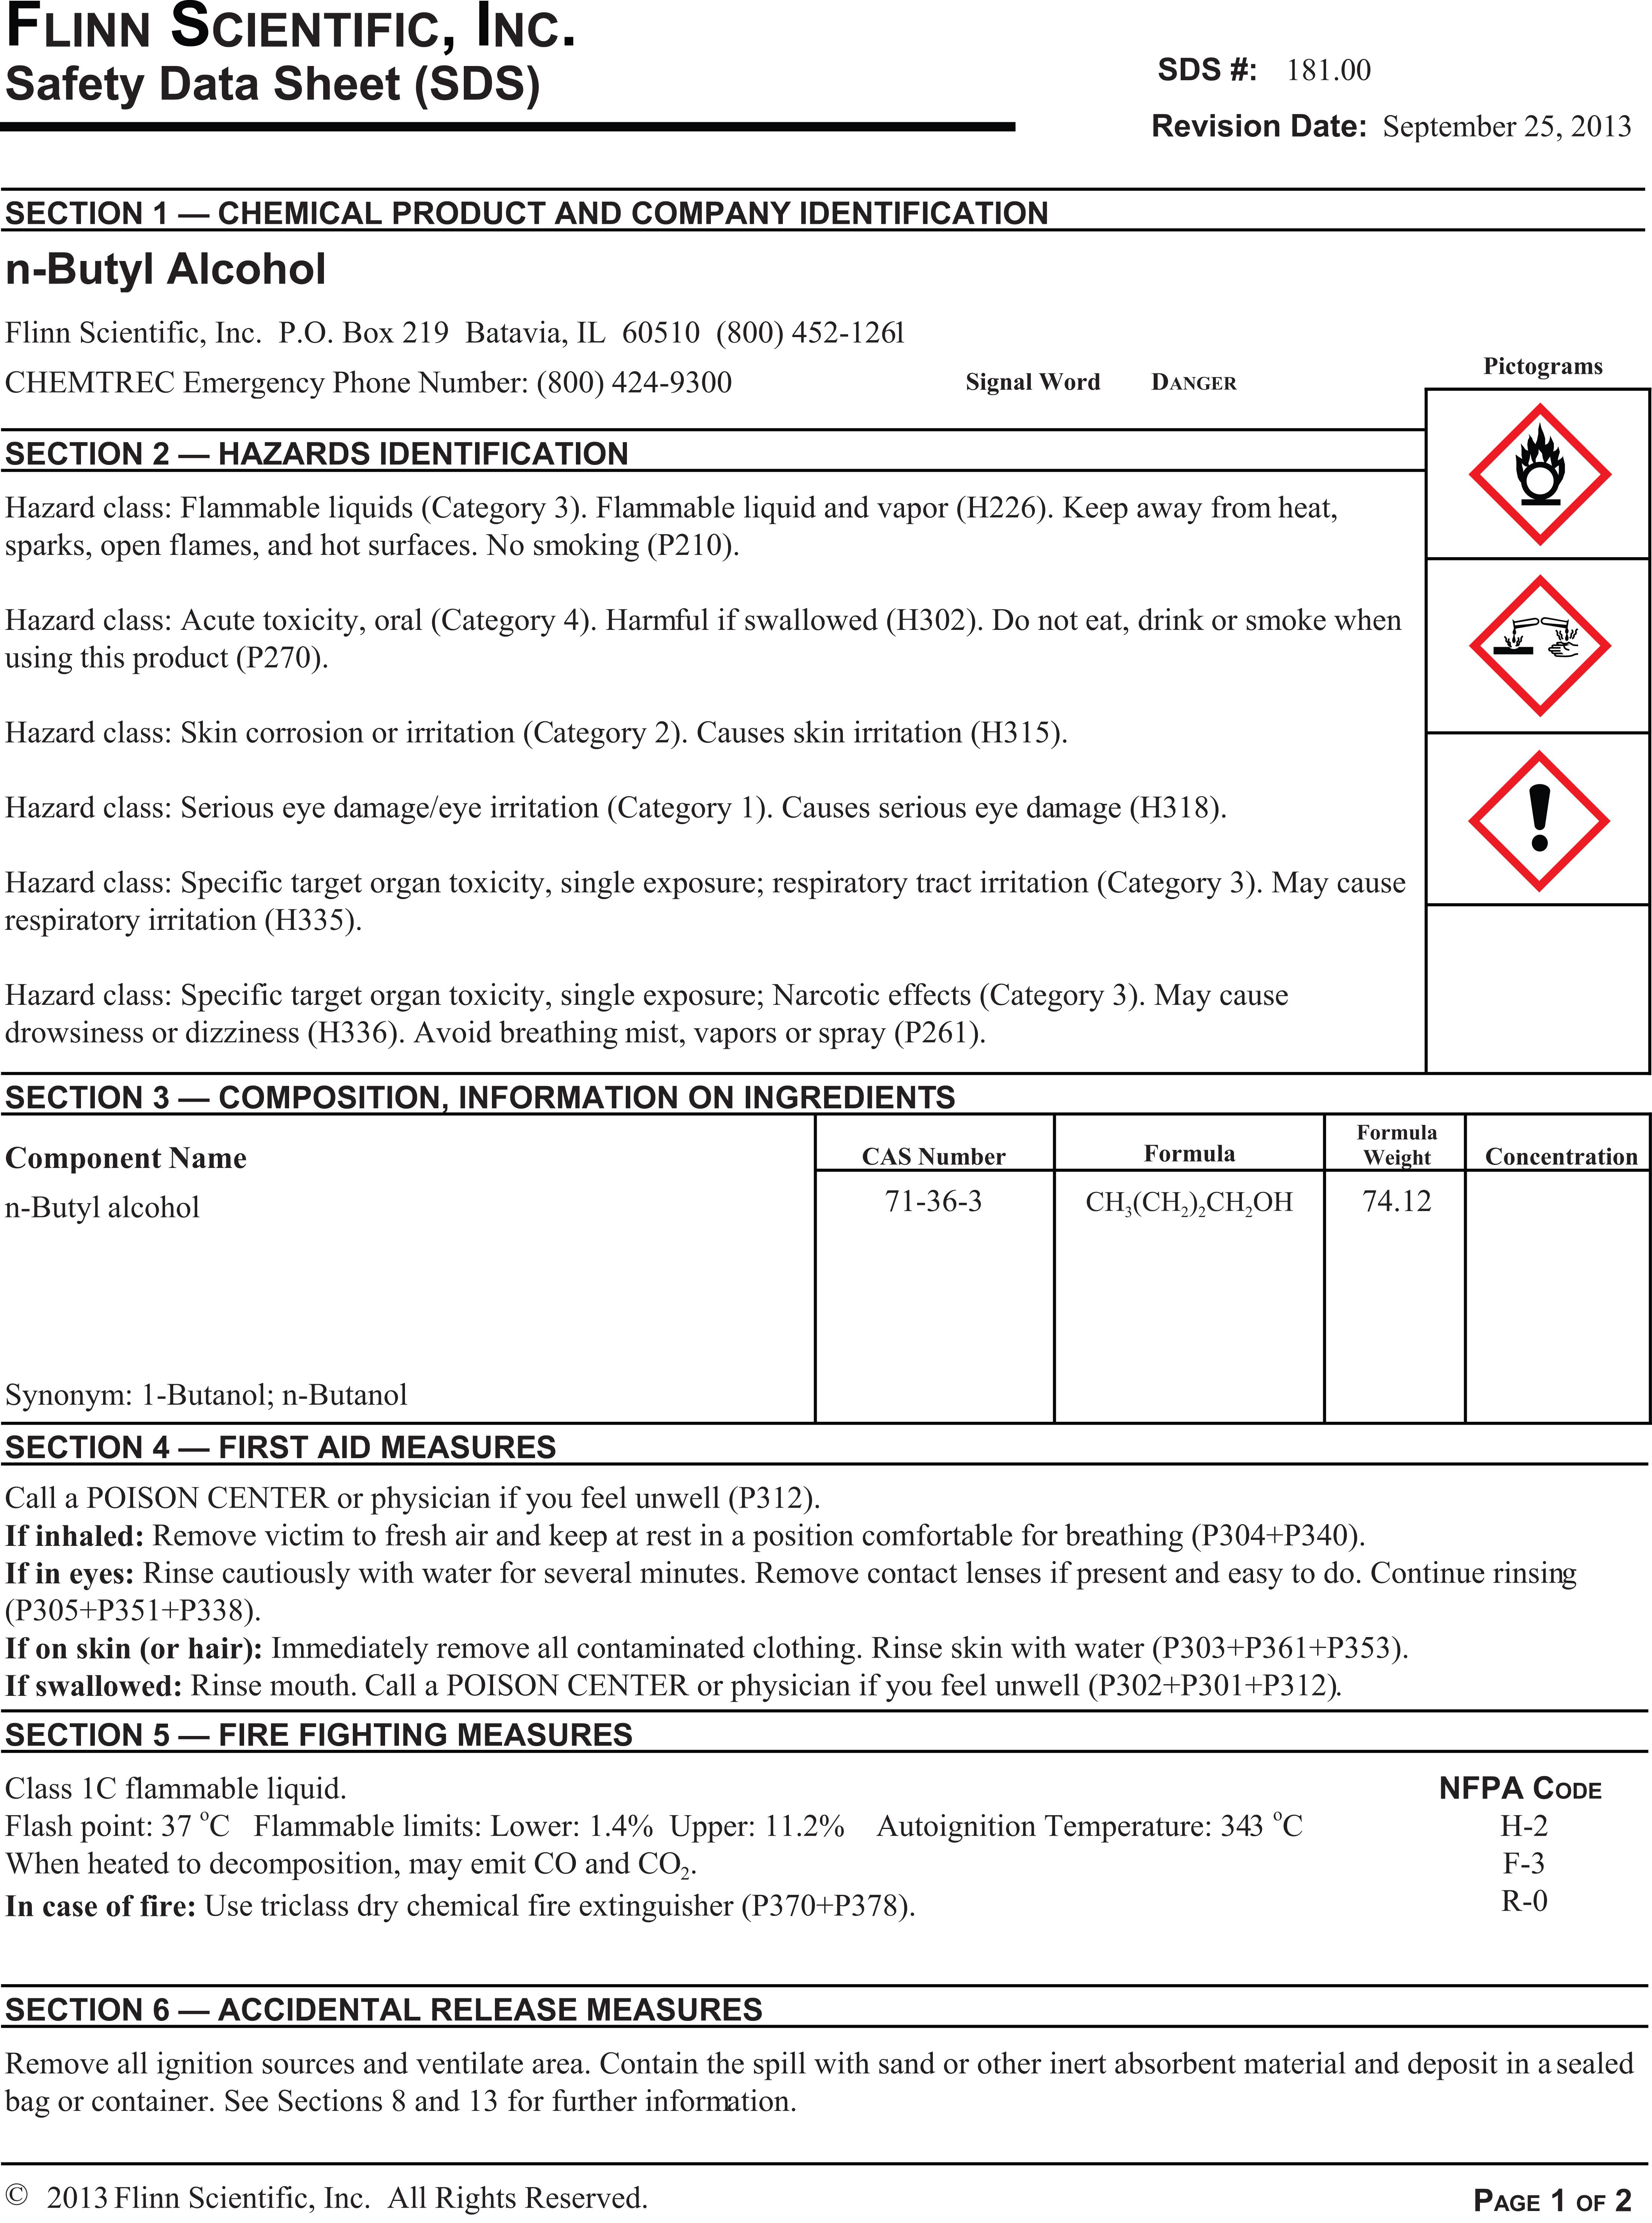 Flinn Safety Data Sheet Sds Library